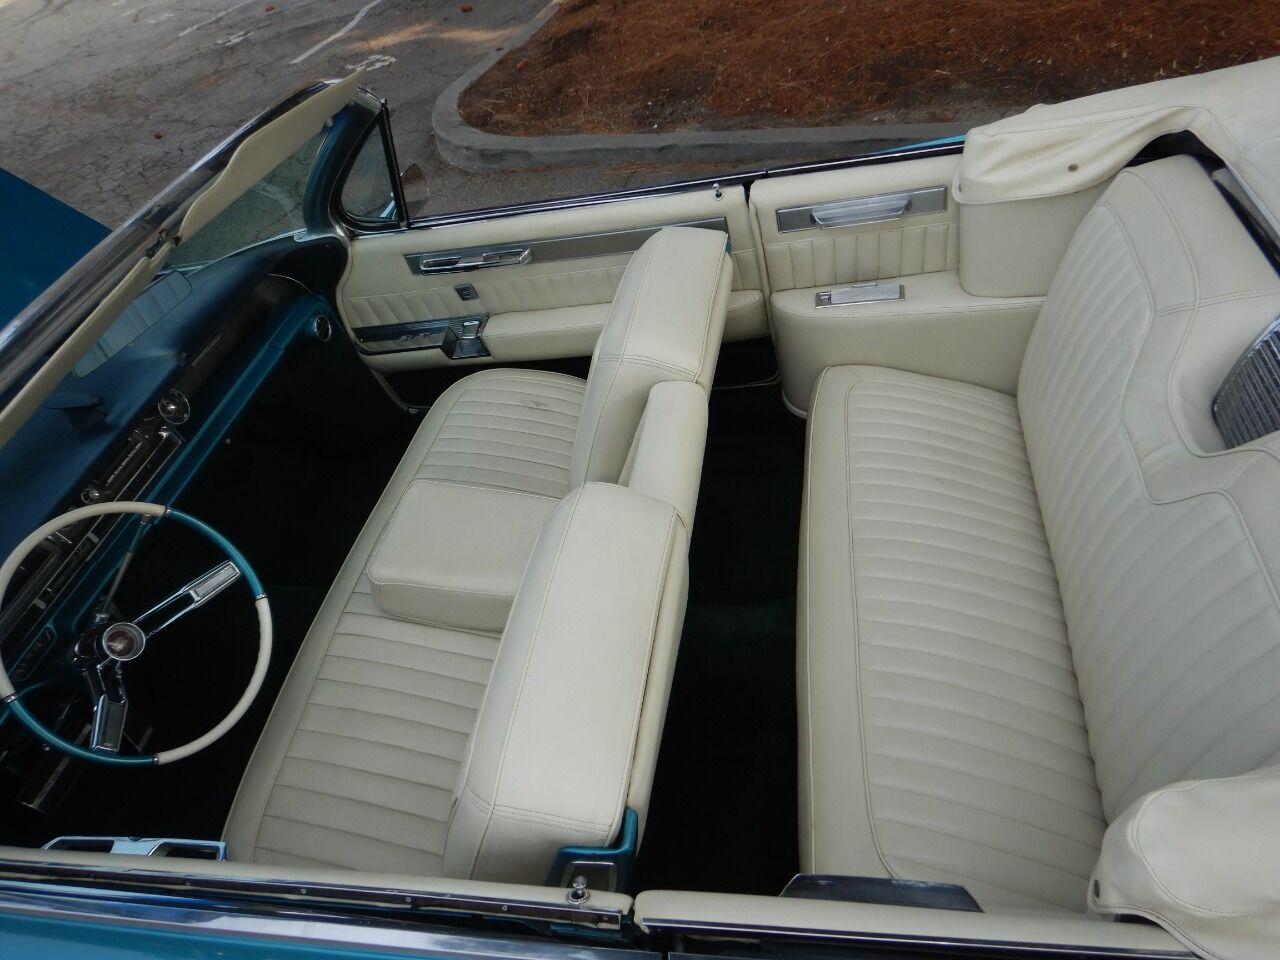 1961 Cadillac Eldorado Biarritz 63